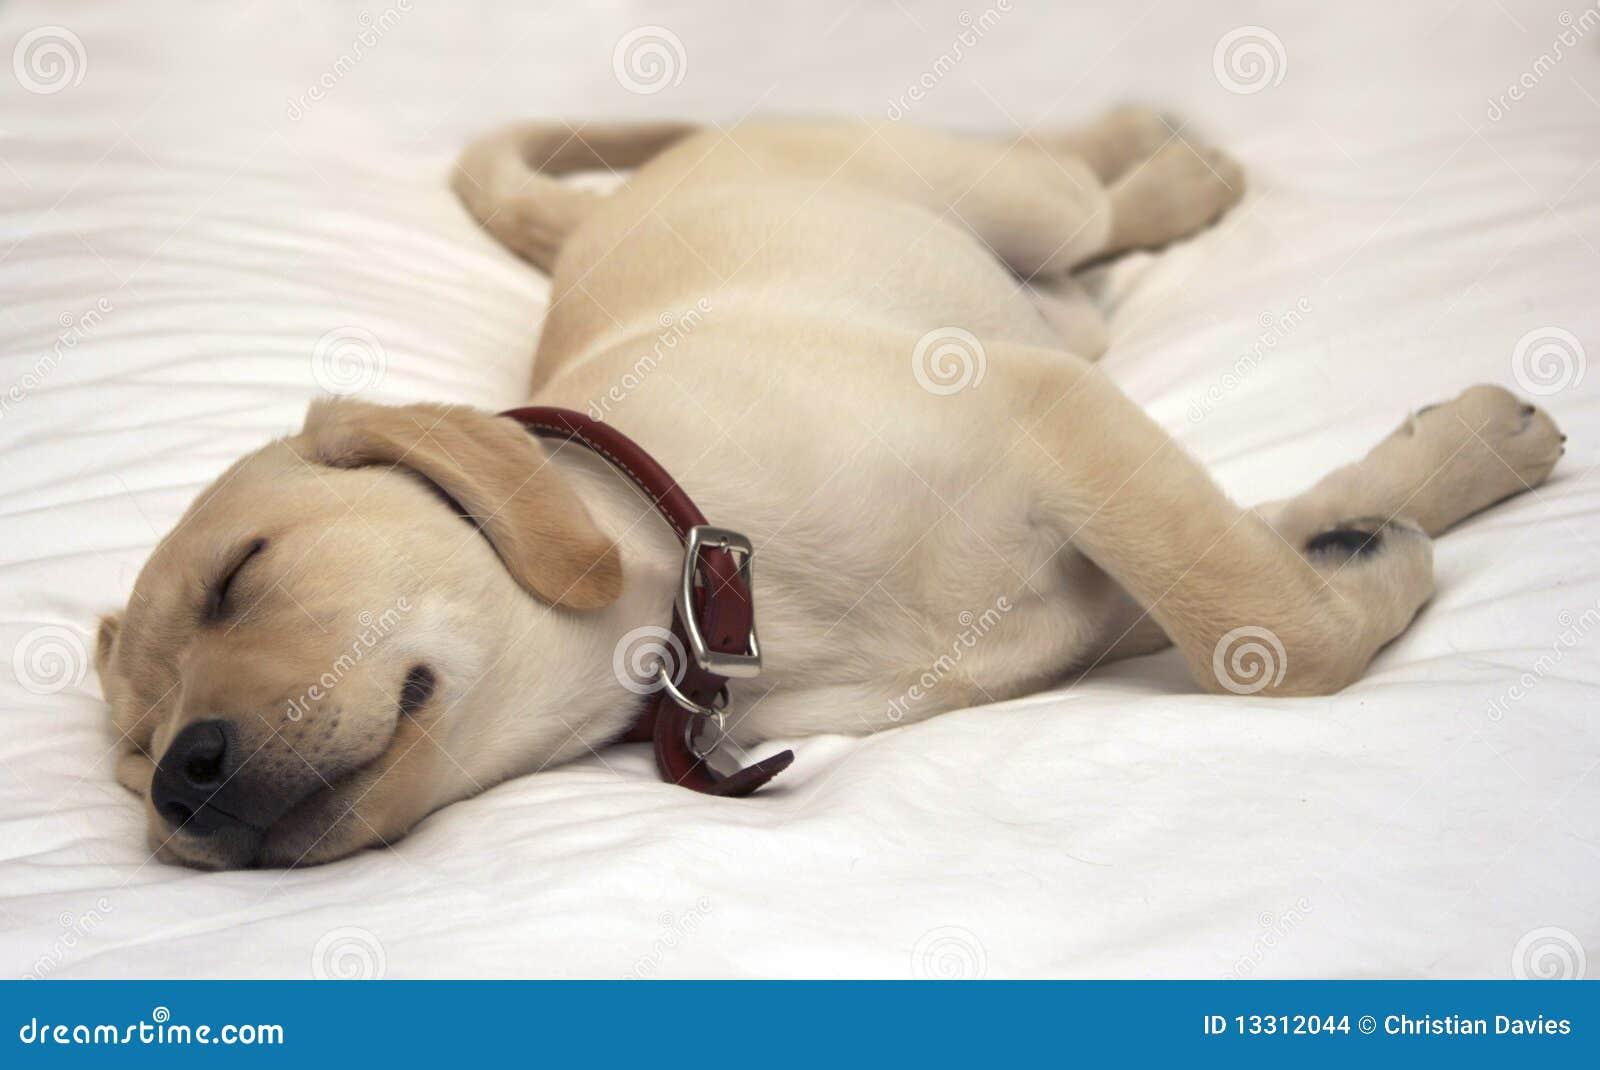 Puppy dog sleeping